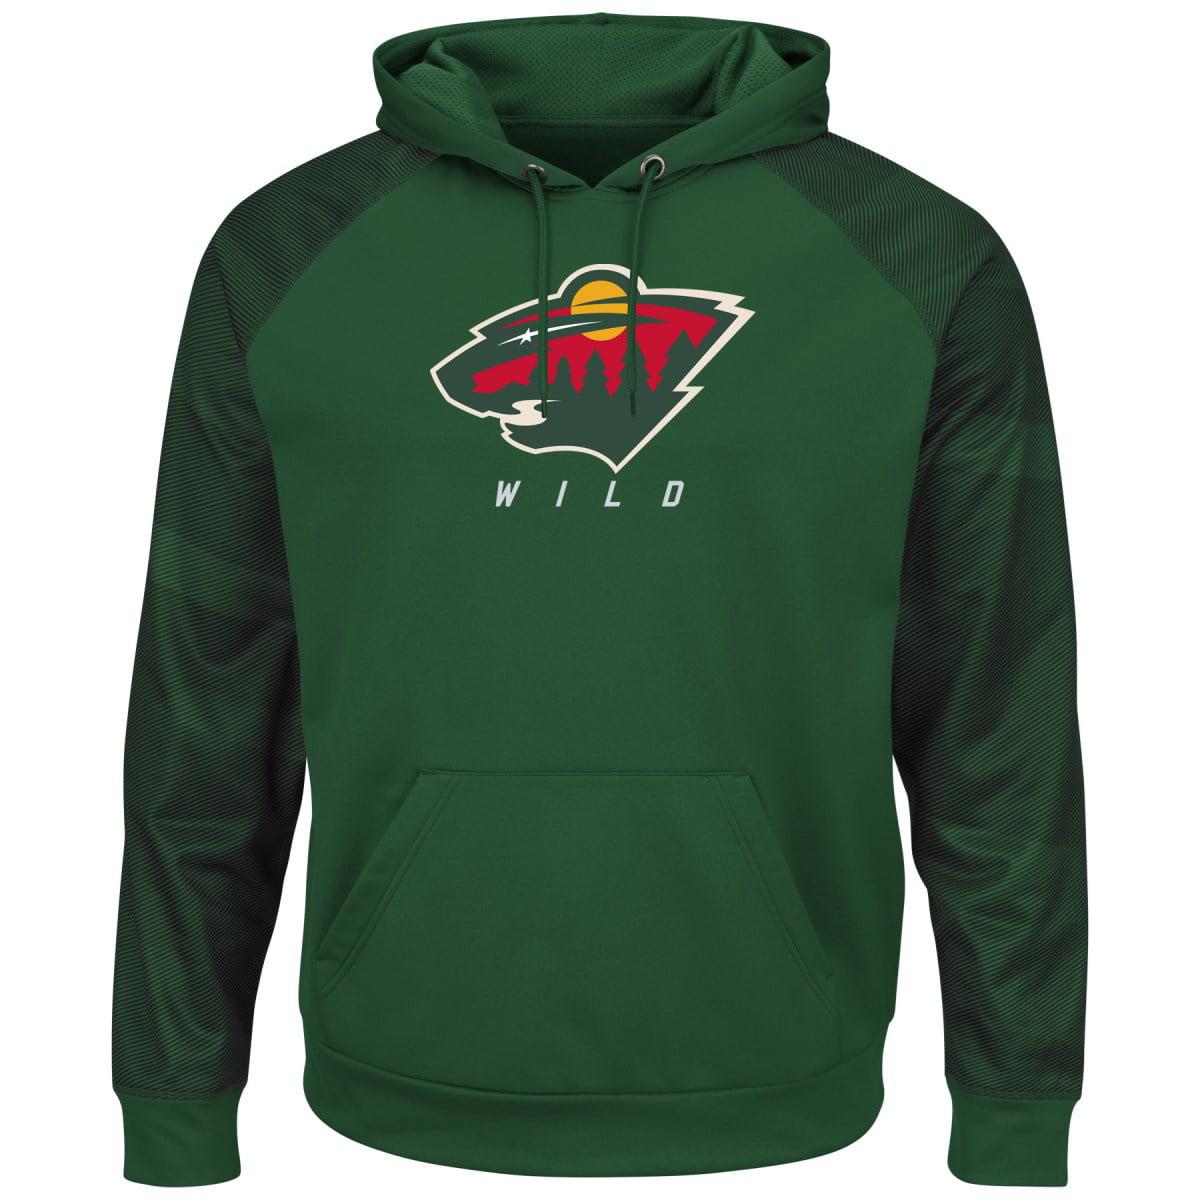 "Minnesota Wild Majestic NHL ""Penalty Shot"" Men's Hooded Therma Base Sweatshirt by MAJESTIC LSG"